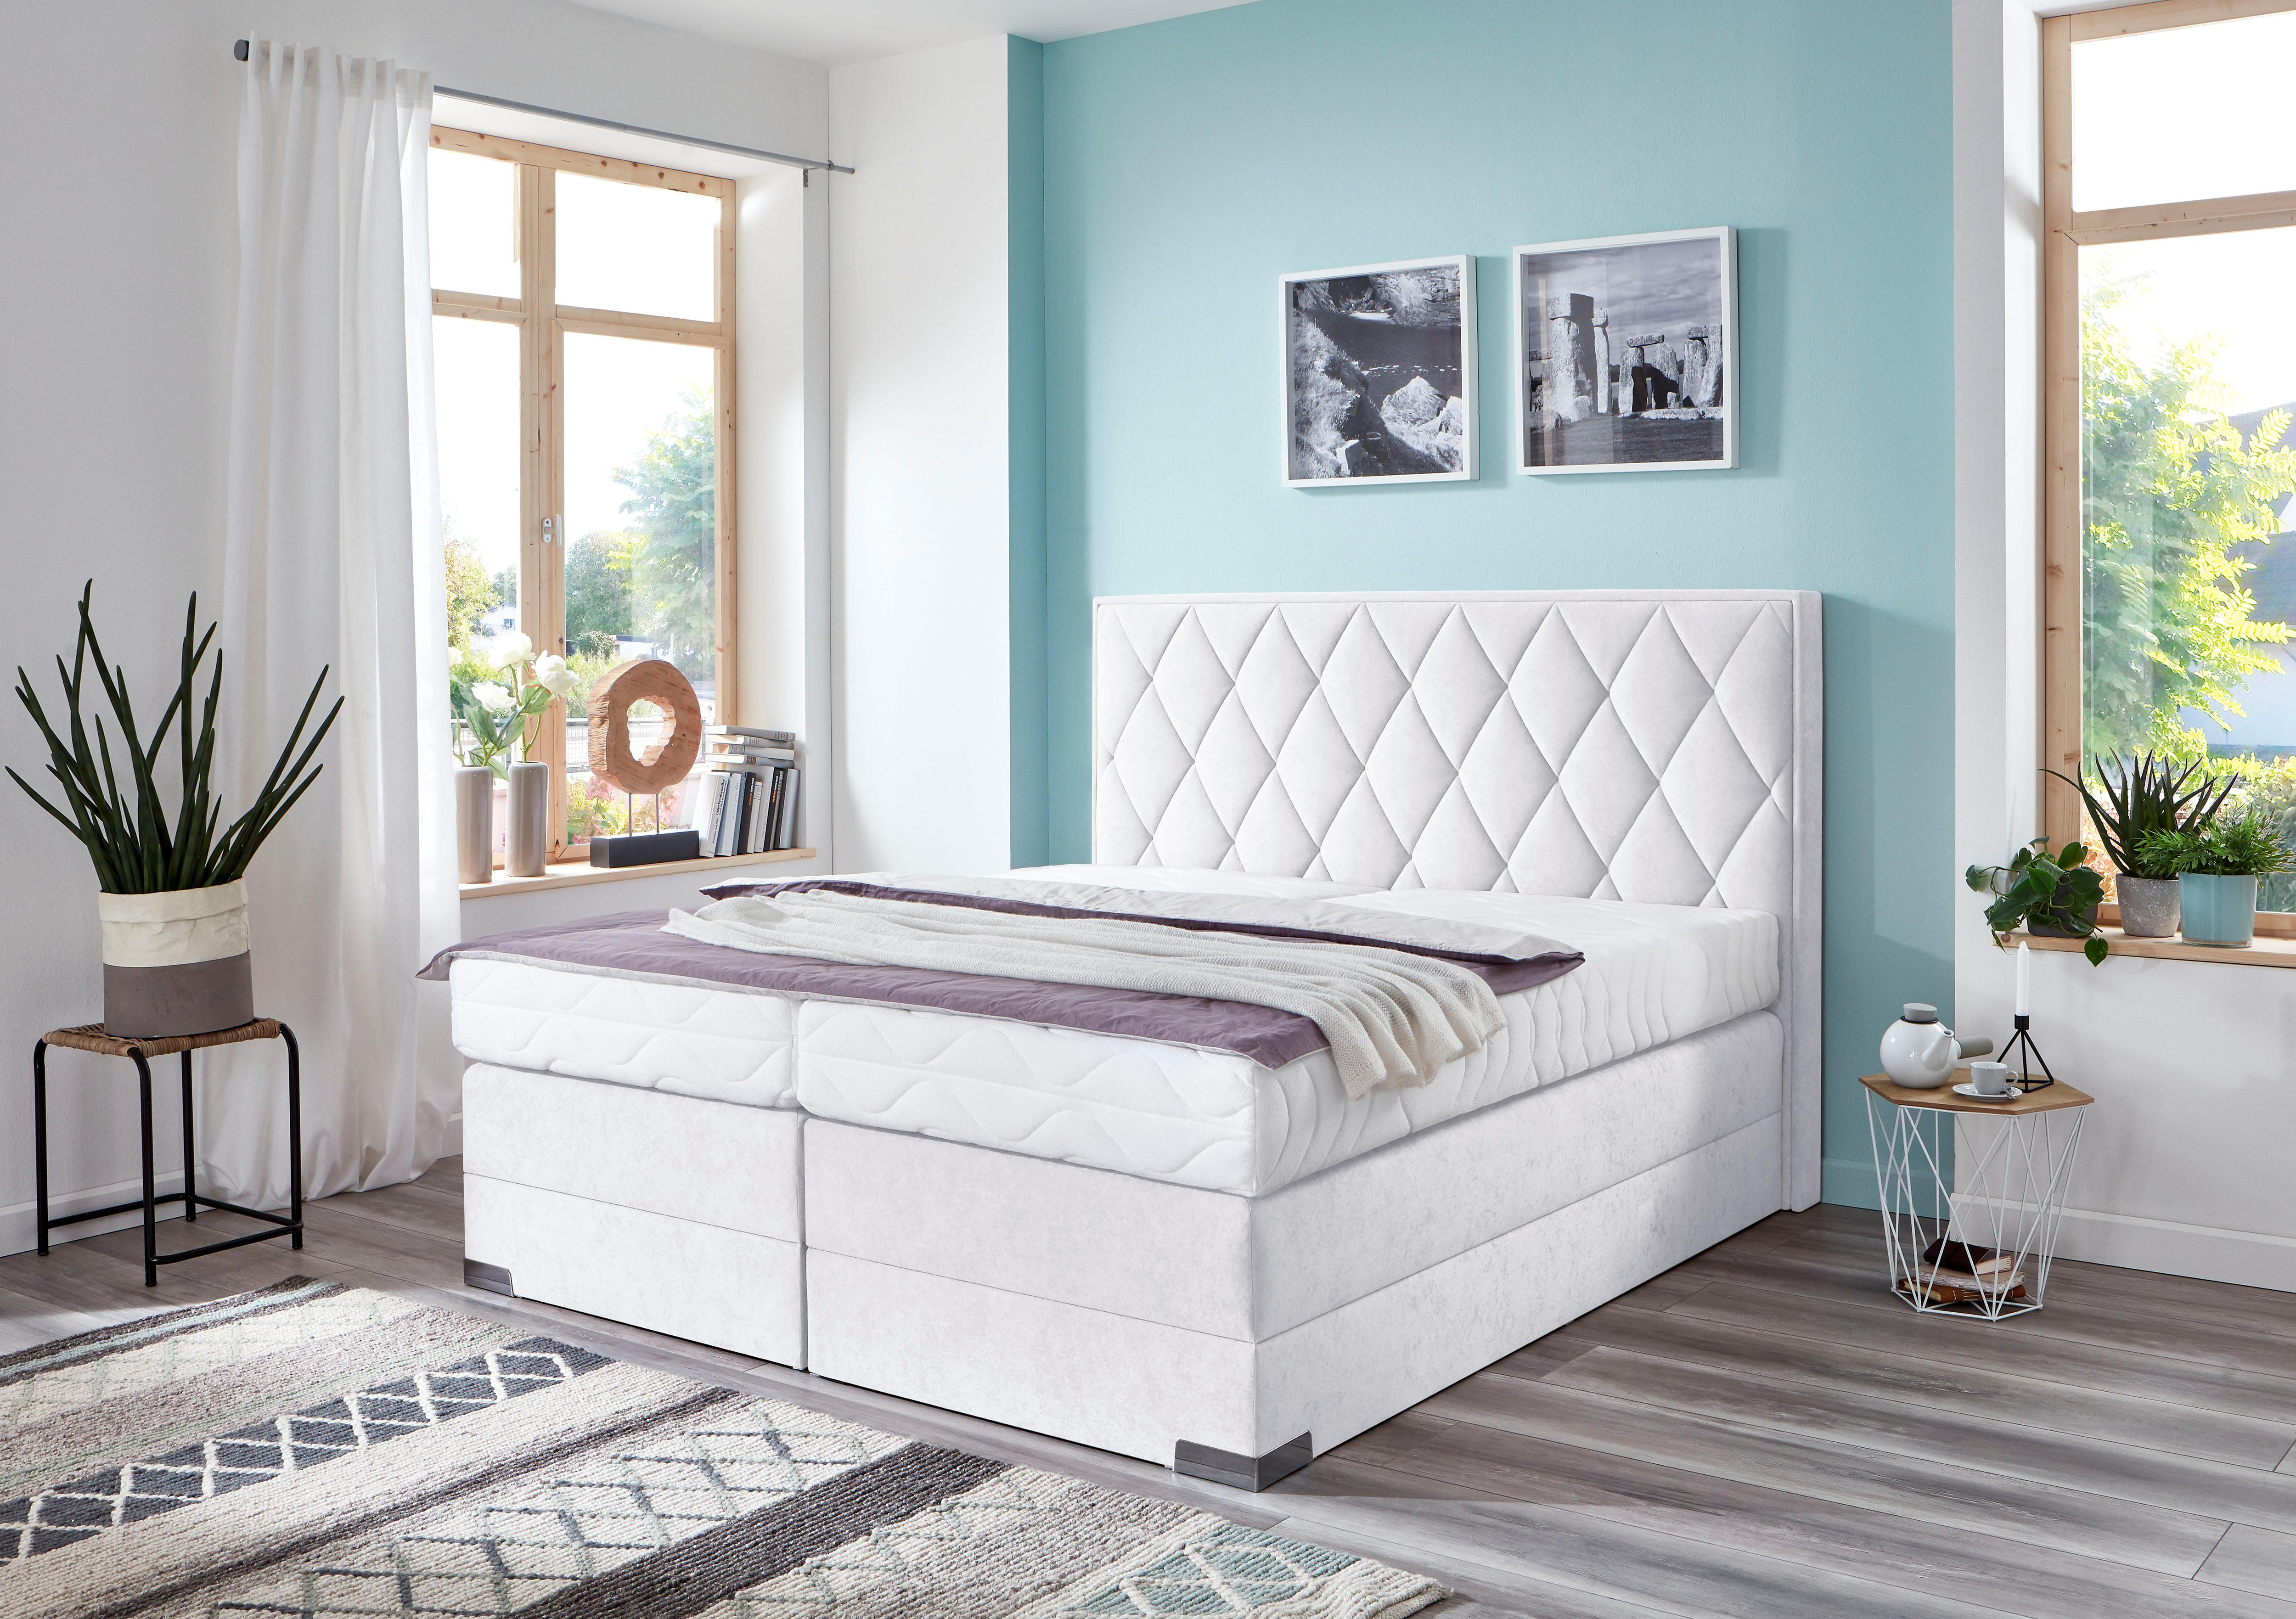 westfalia schlafkomfort boxspringbett auf raten bestellen. Black Bedroom Furniture Sets. Home Design Ideas